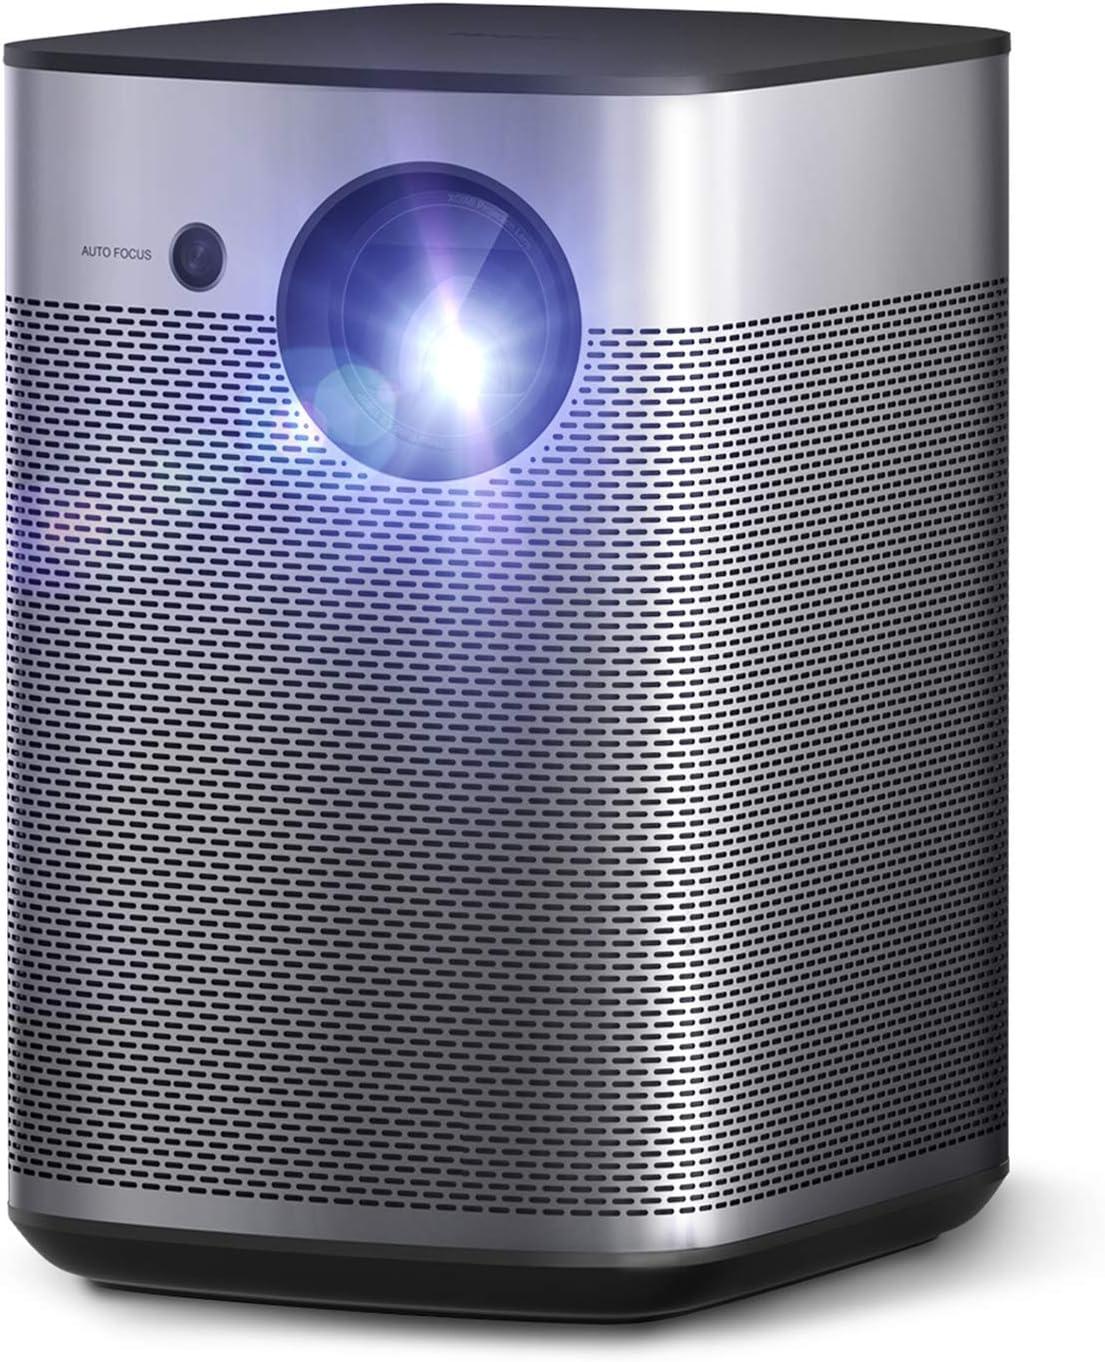 XGIMI Halo 1080p Portable Projector